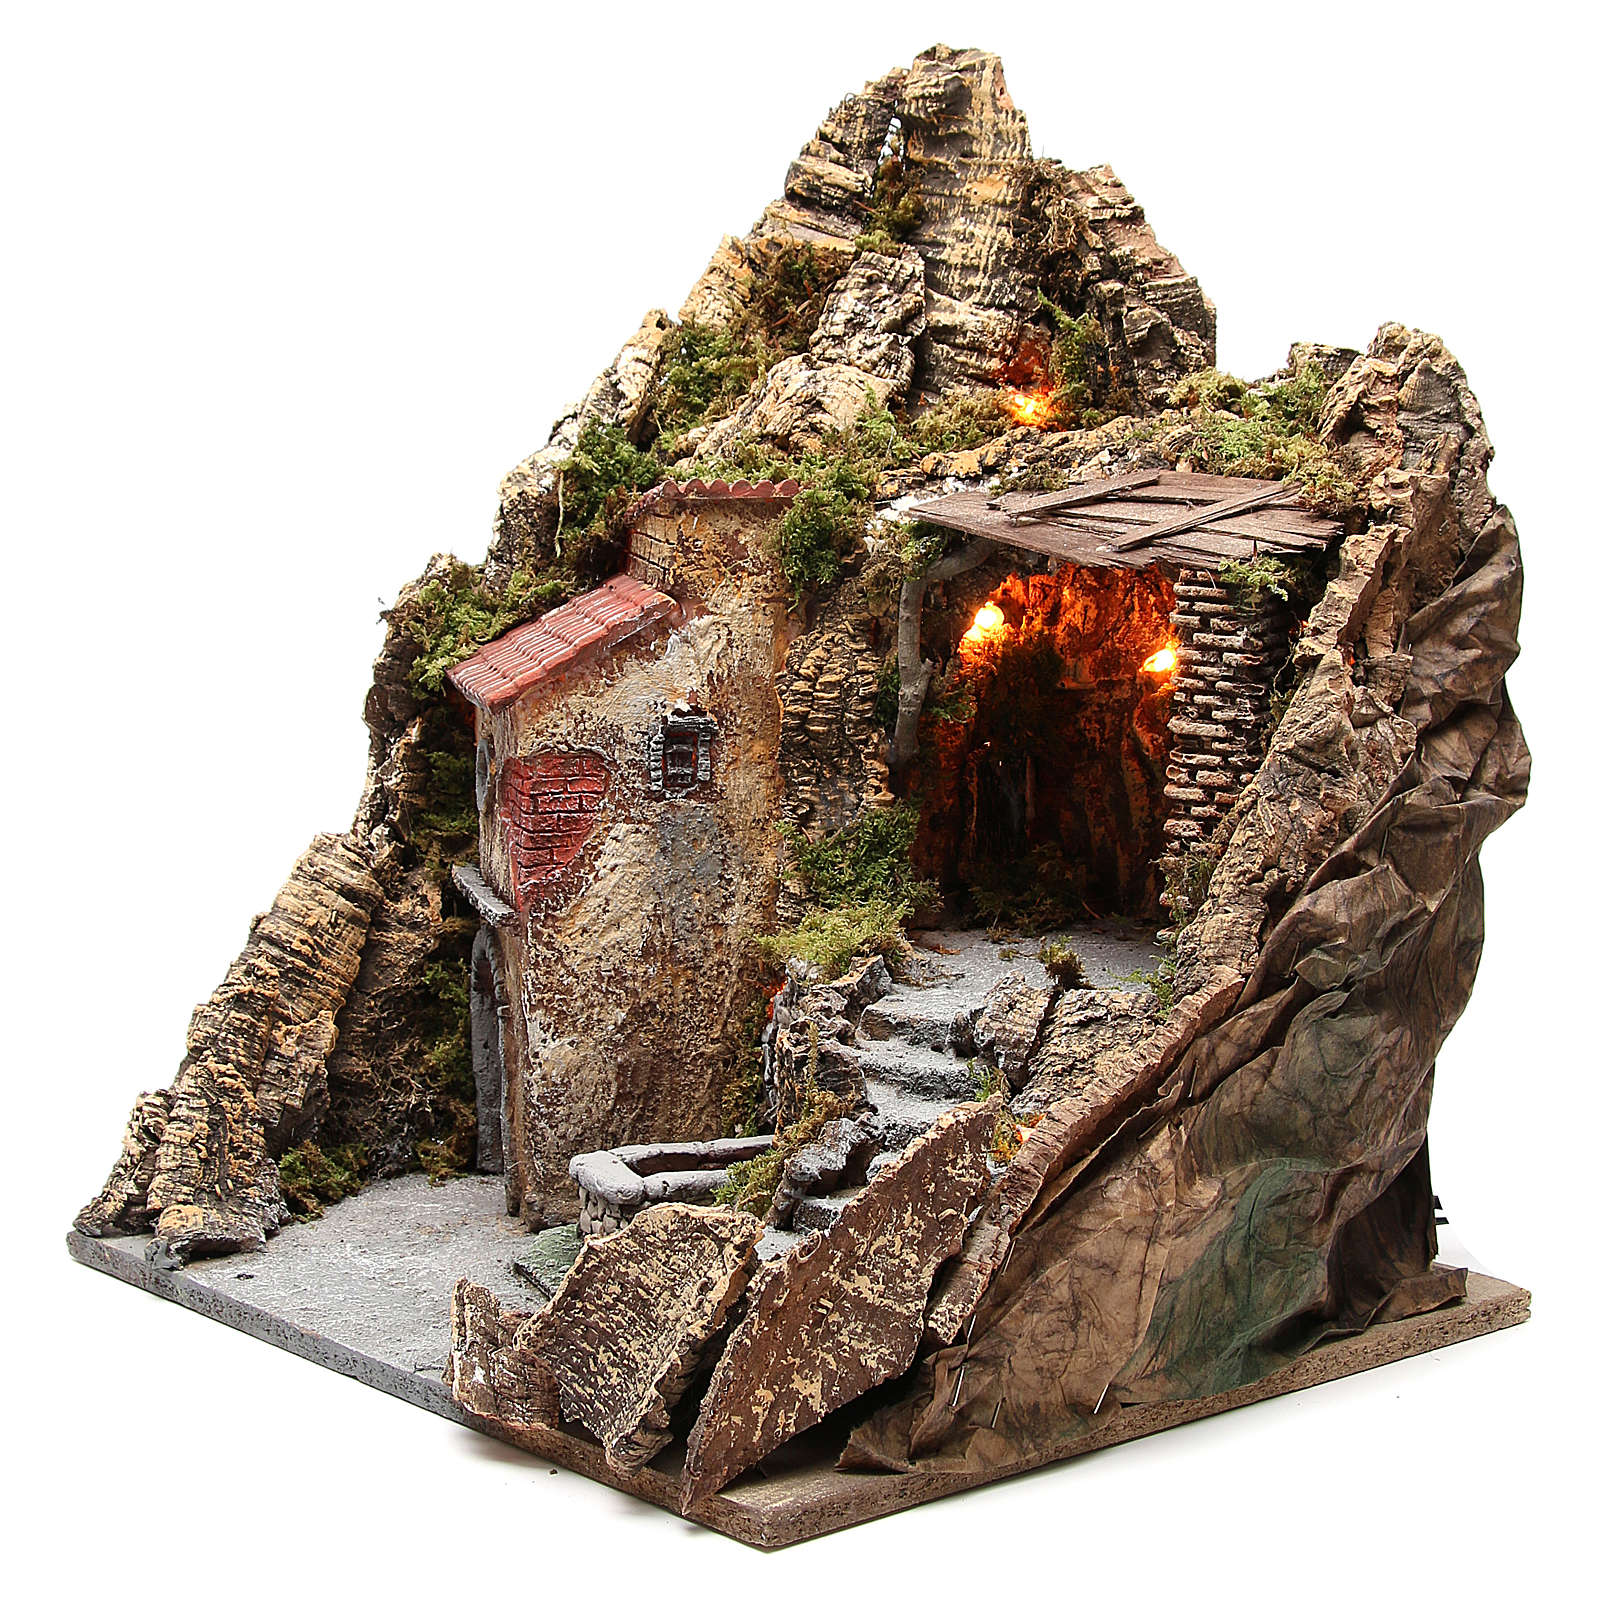 Borgo con grotta e fontana presepe Napoli 38x45x35 cm 4